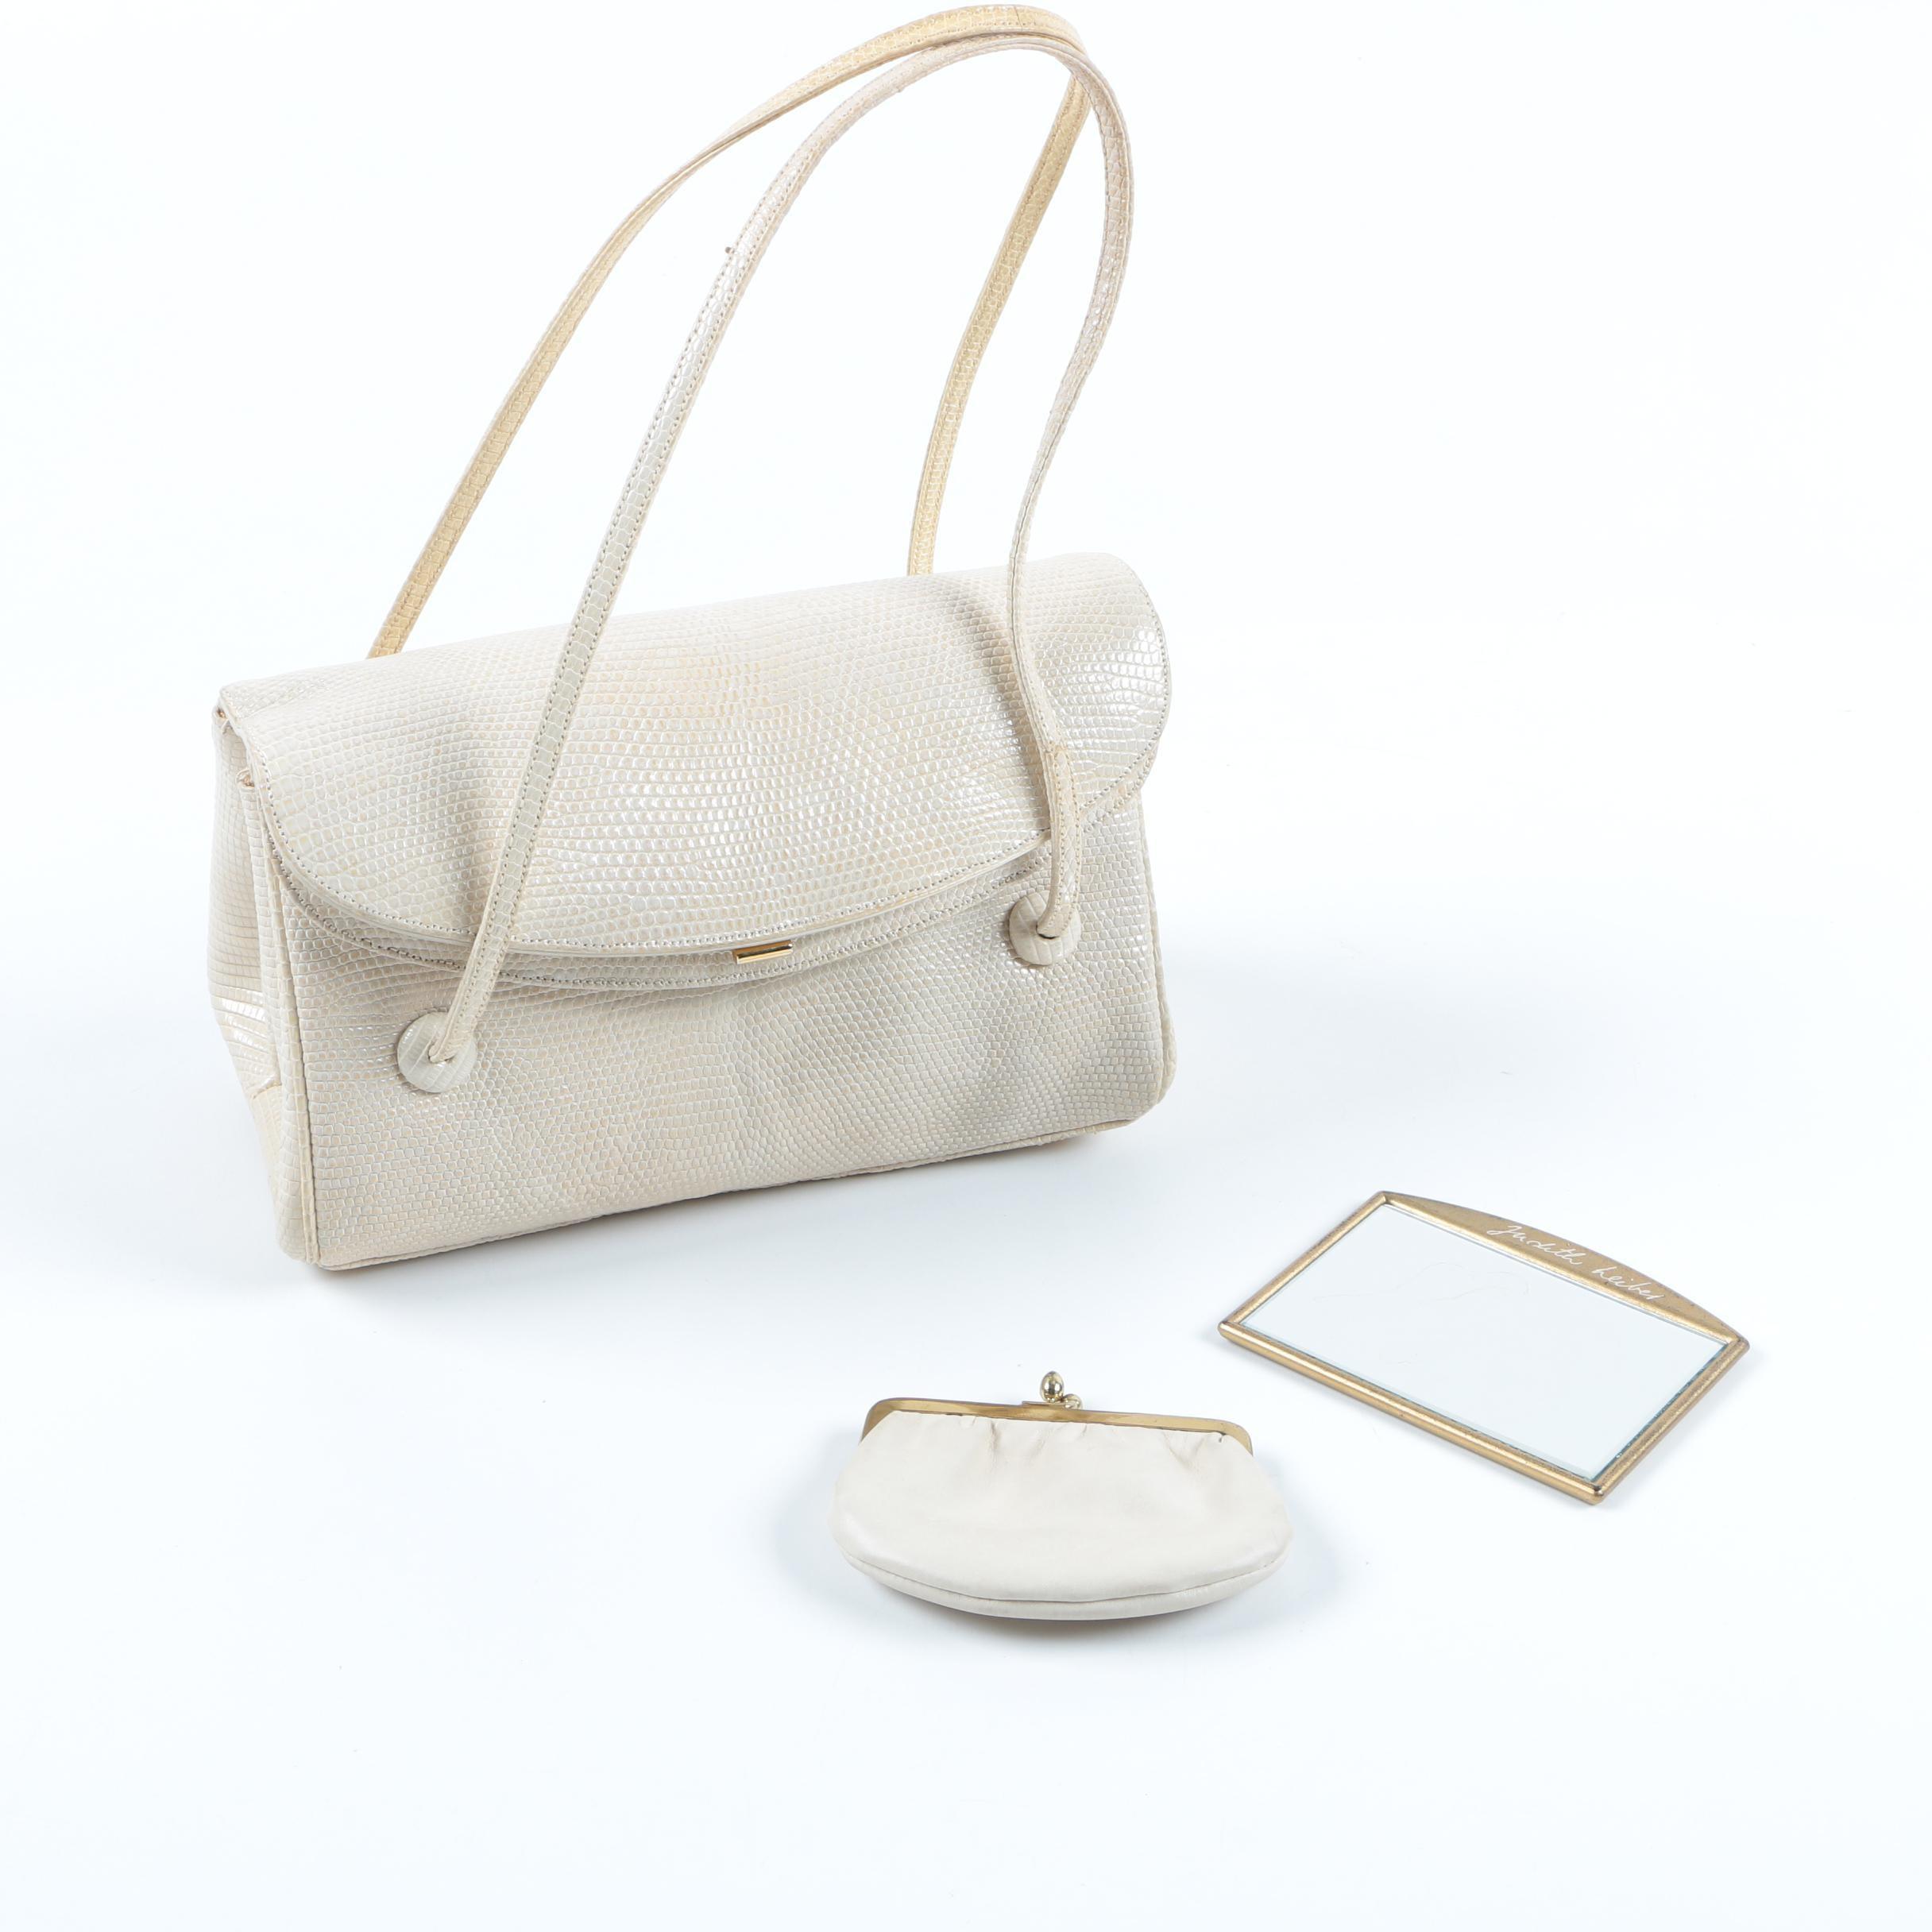 Judith Leiber Embossed Leather Handbag